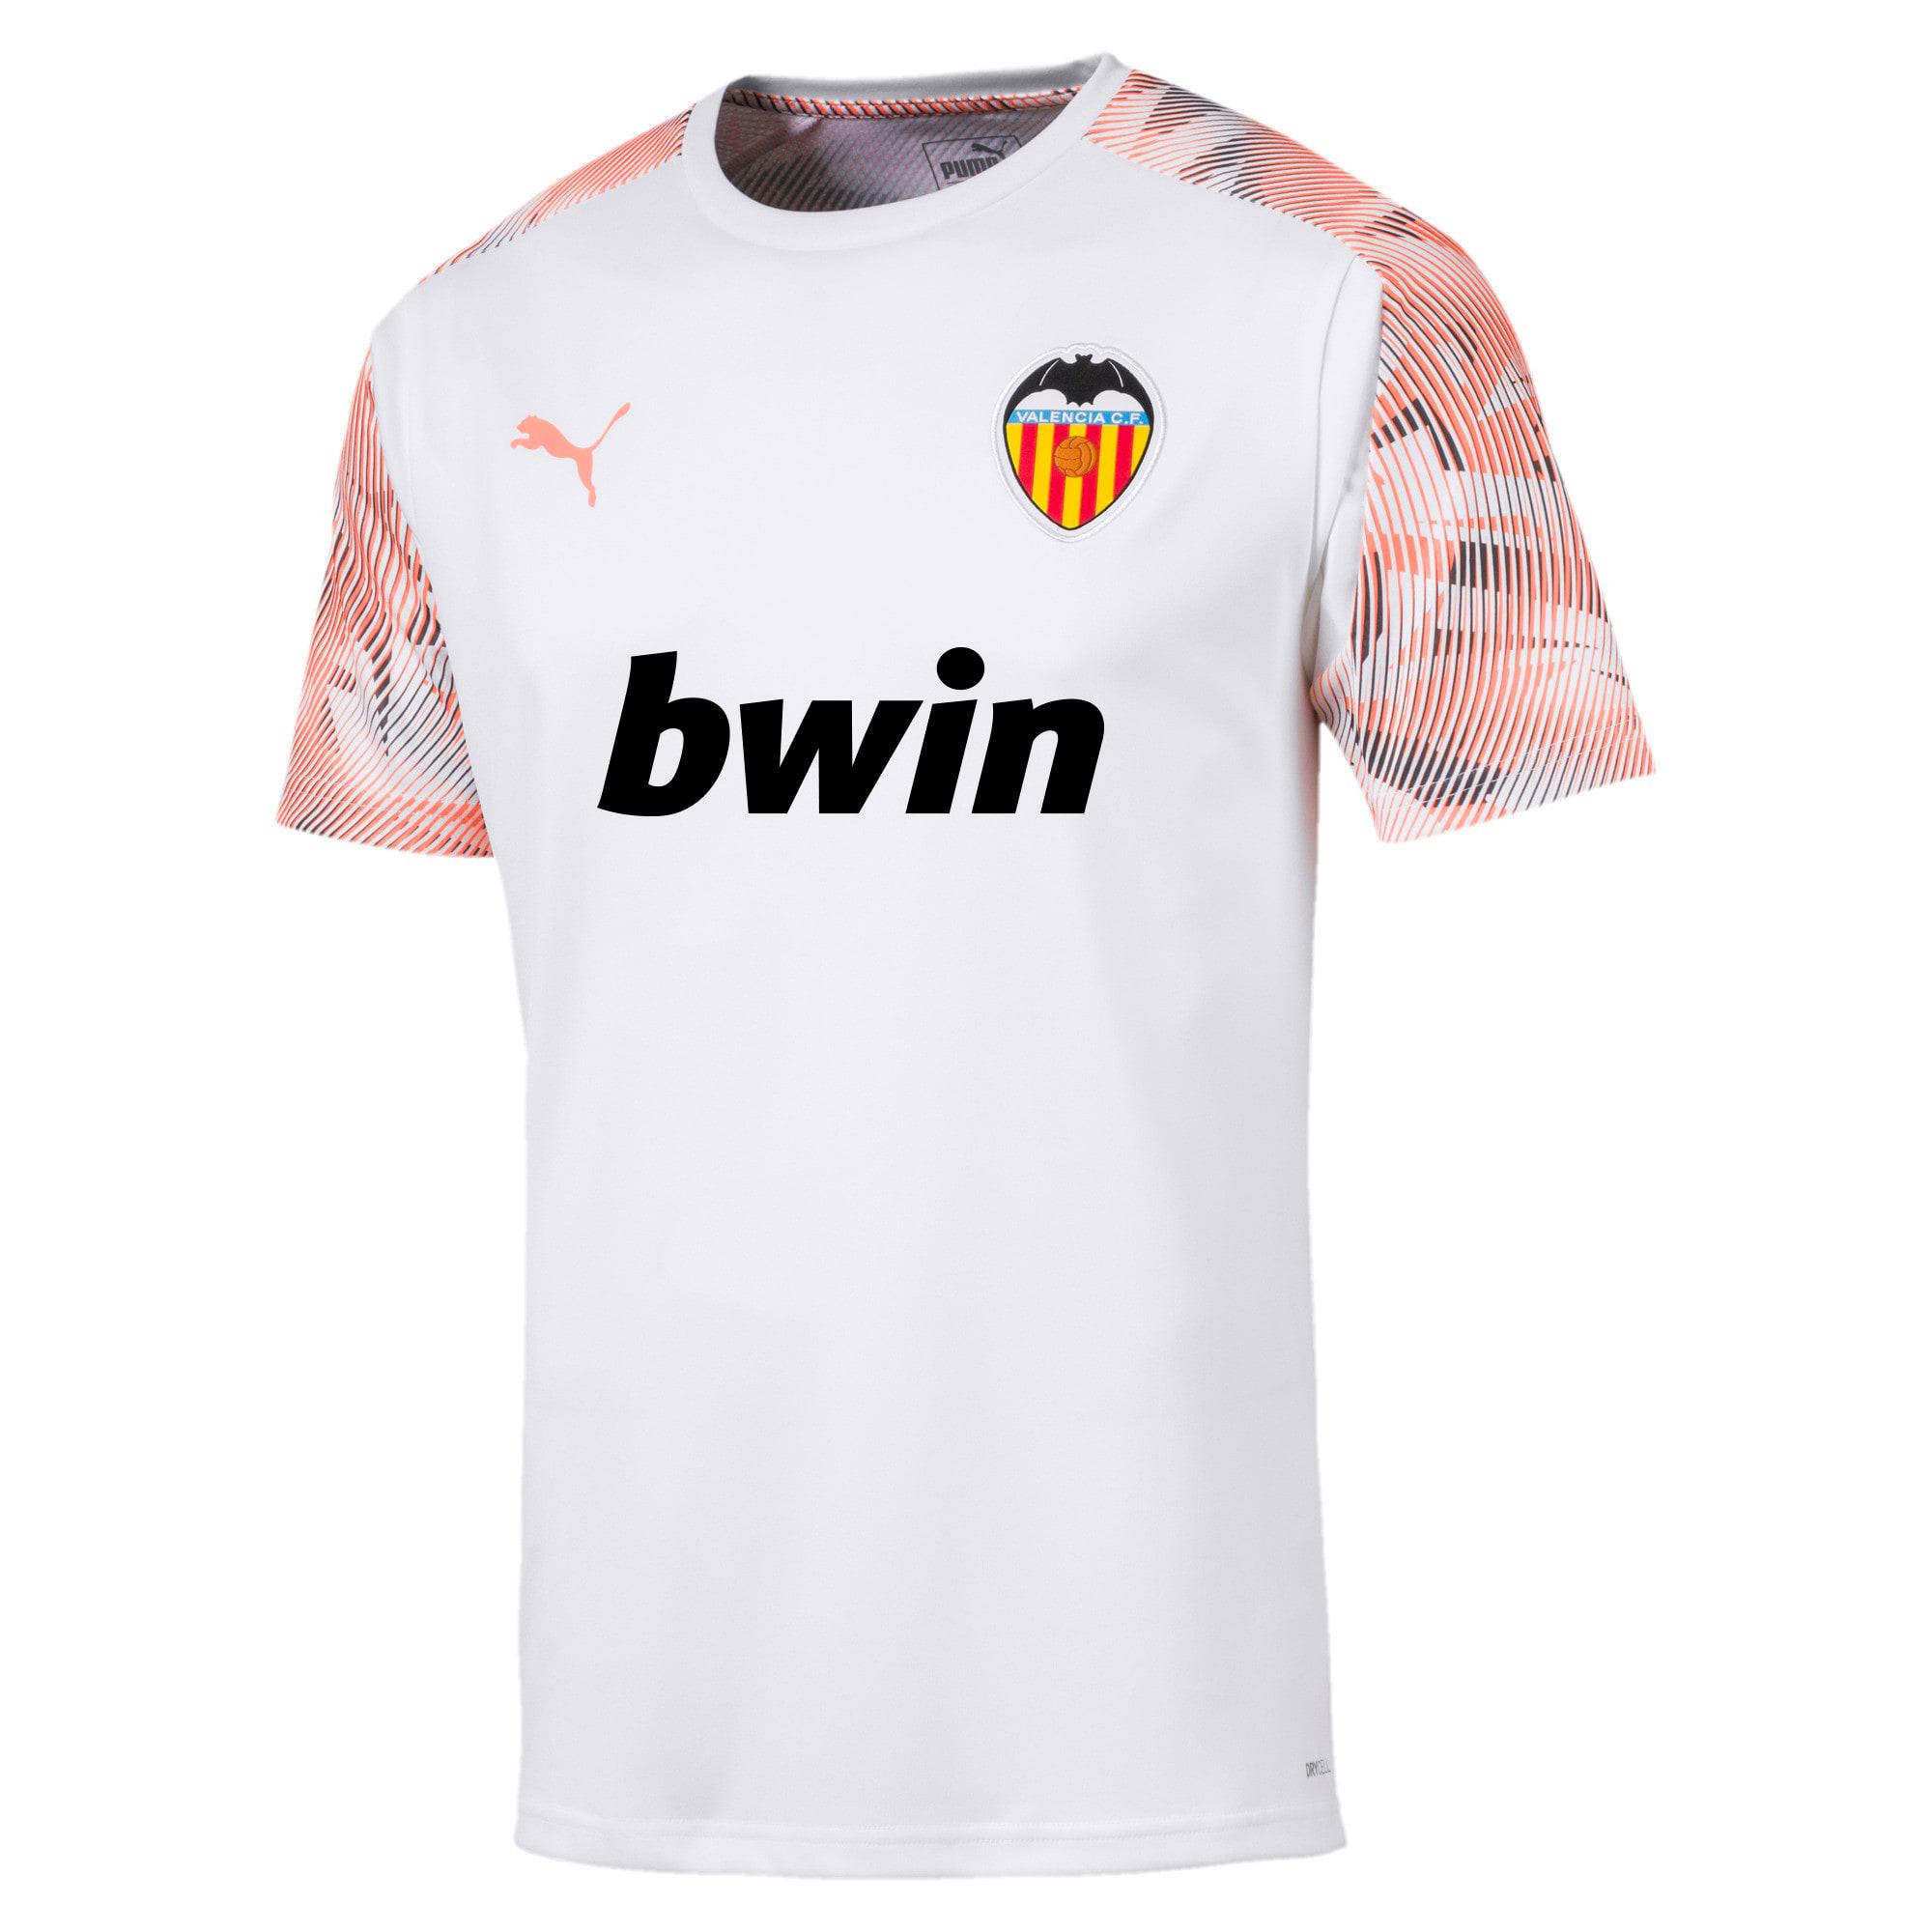 Thumbnail 1 of Valencia CF Men's Training Jersey, Puma White-Fizzy Orange, medium